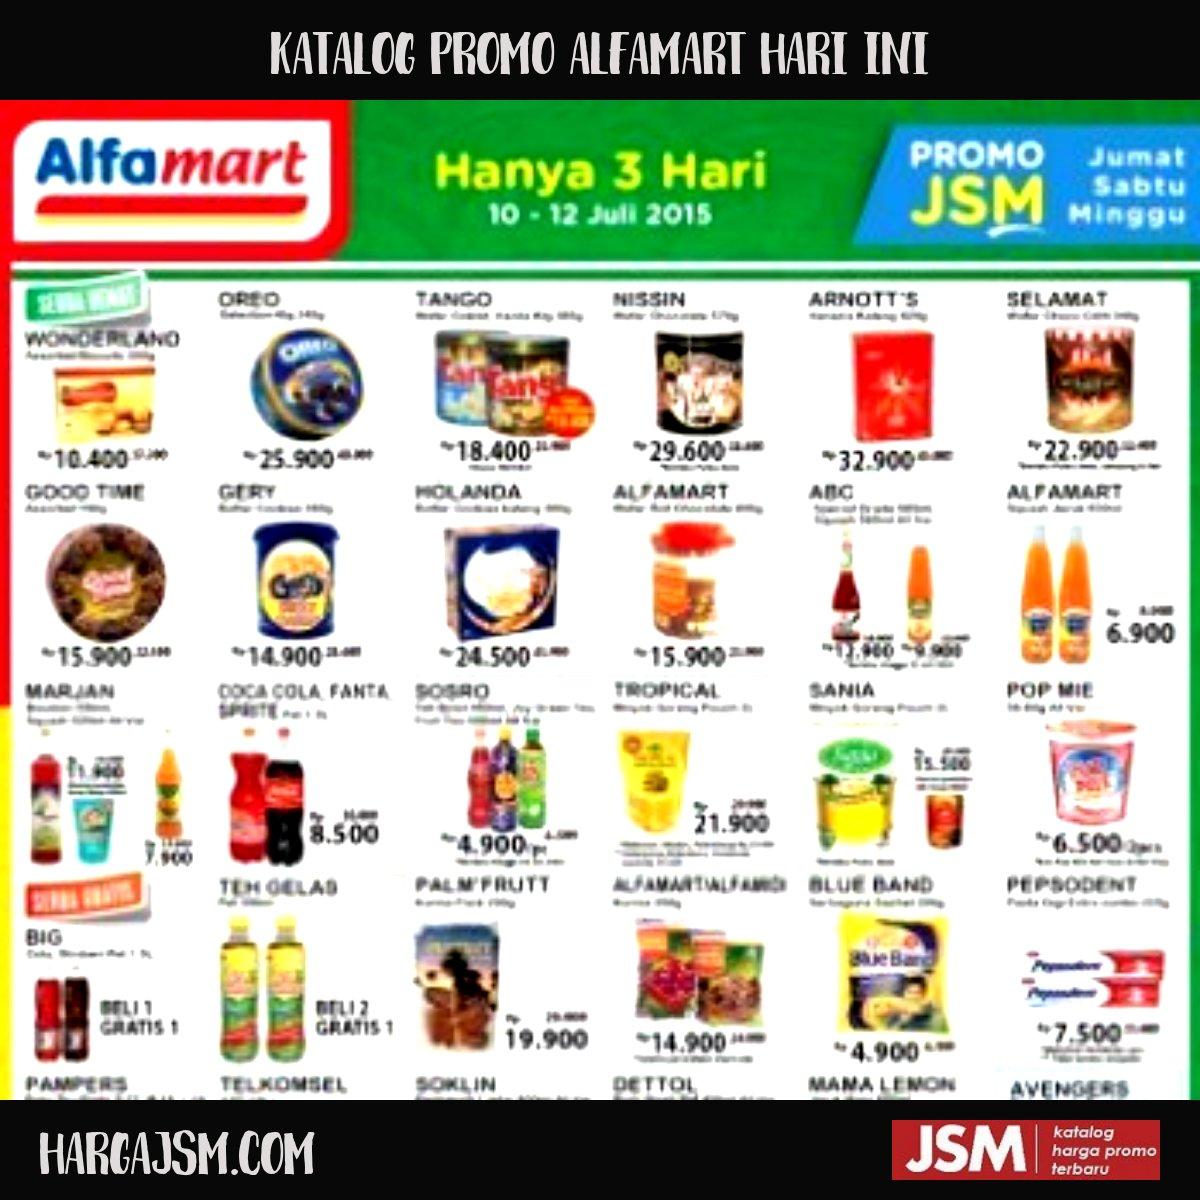 Katalog Promo Alfamart 25 September 2018